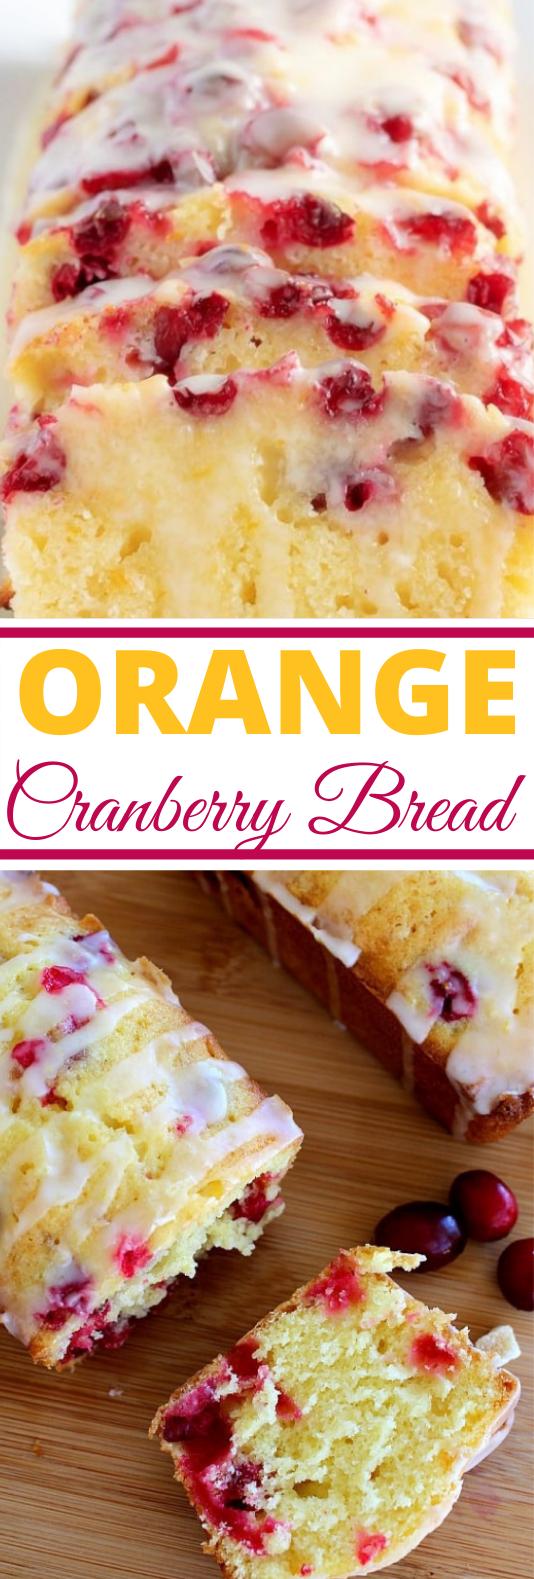 Orange Cranberry Bread with Glaze #cake #desserts #baking #breakfast #bread